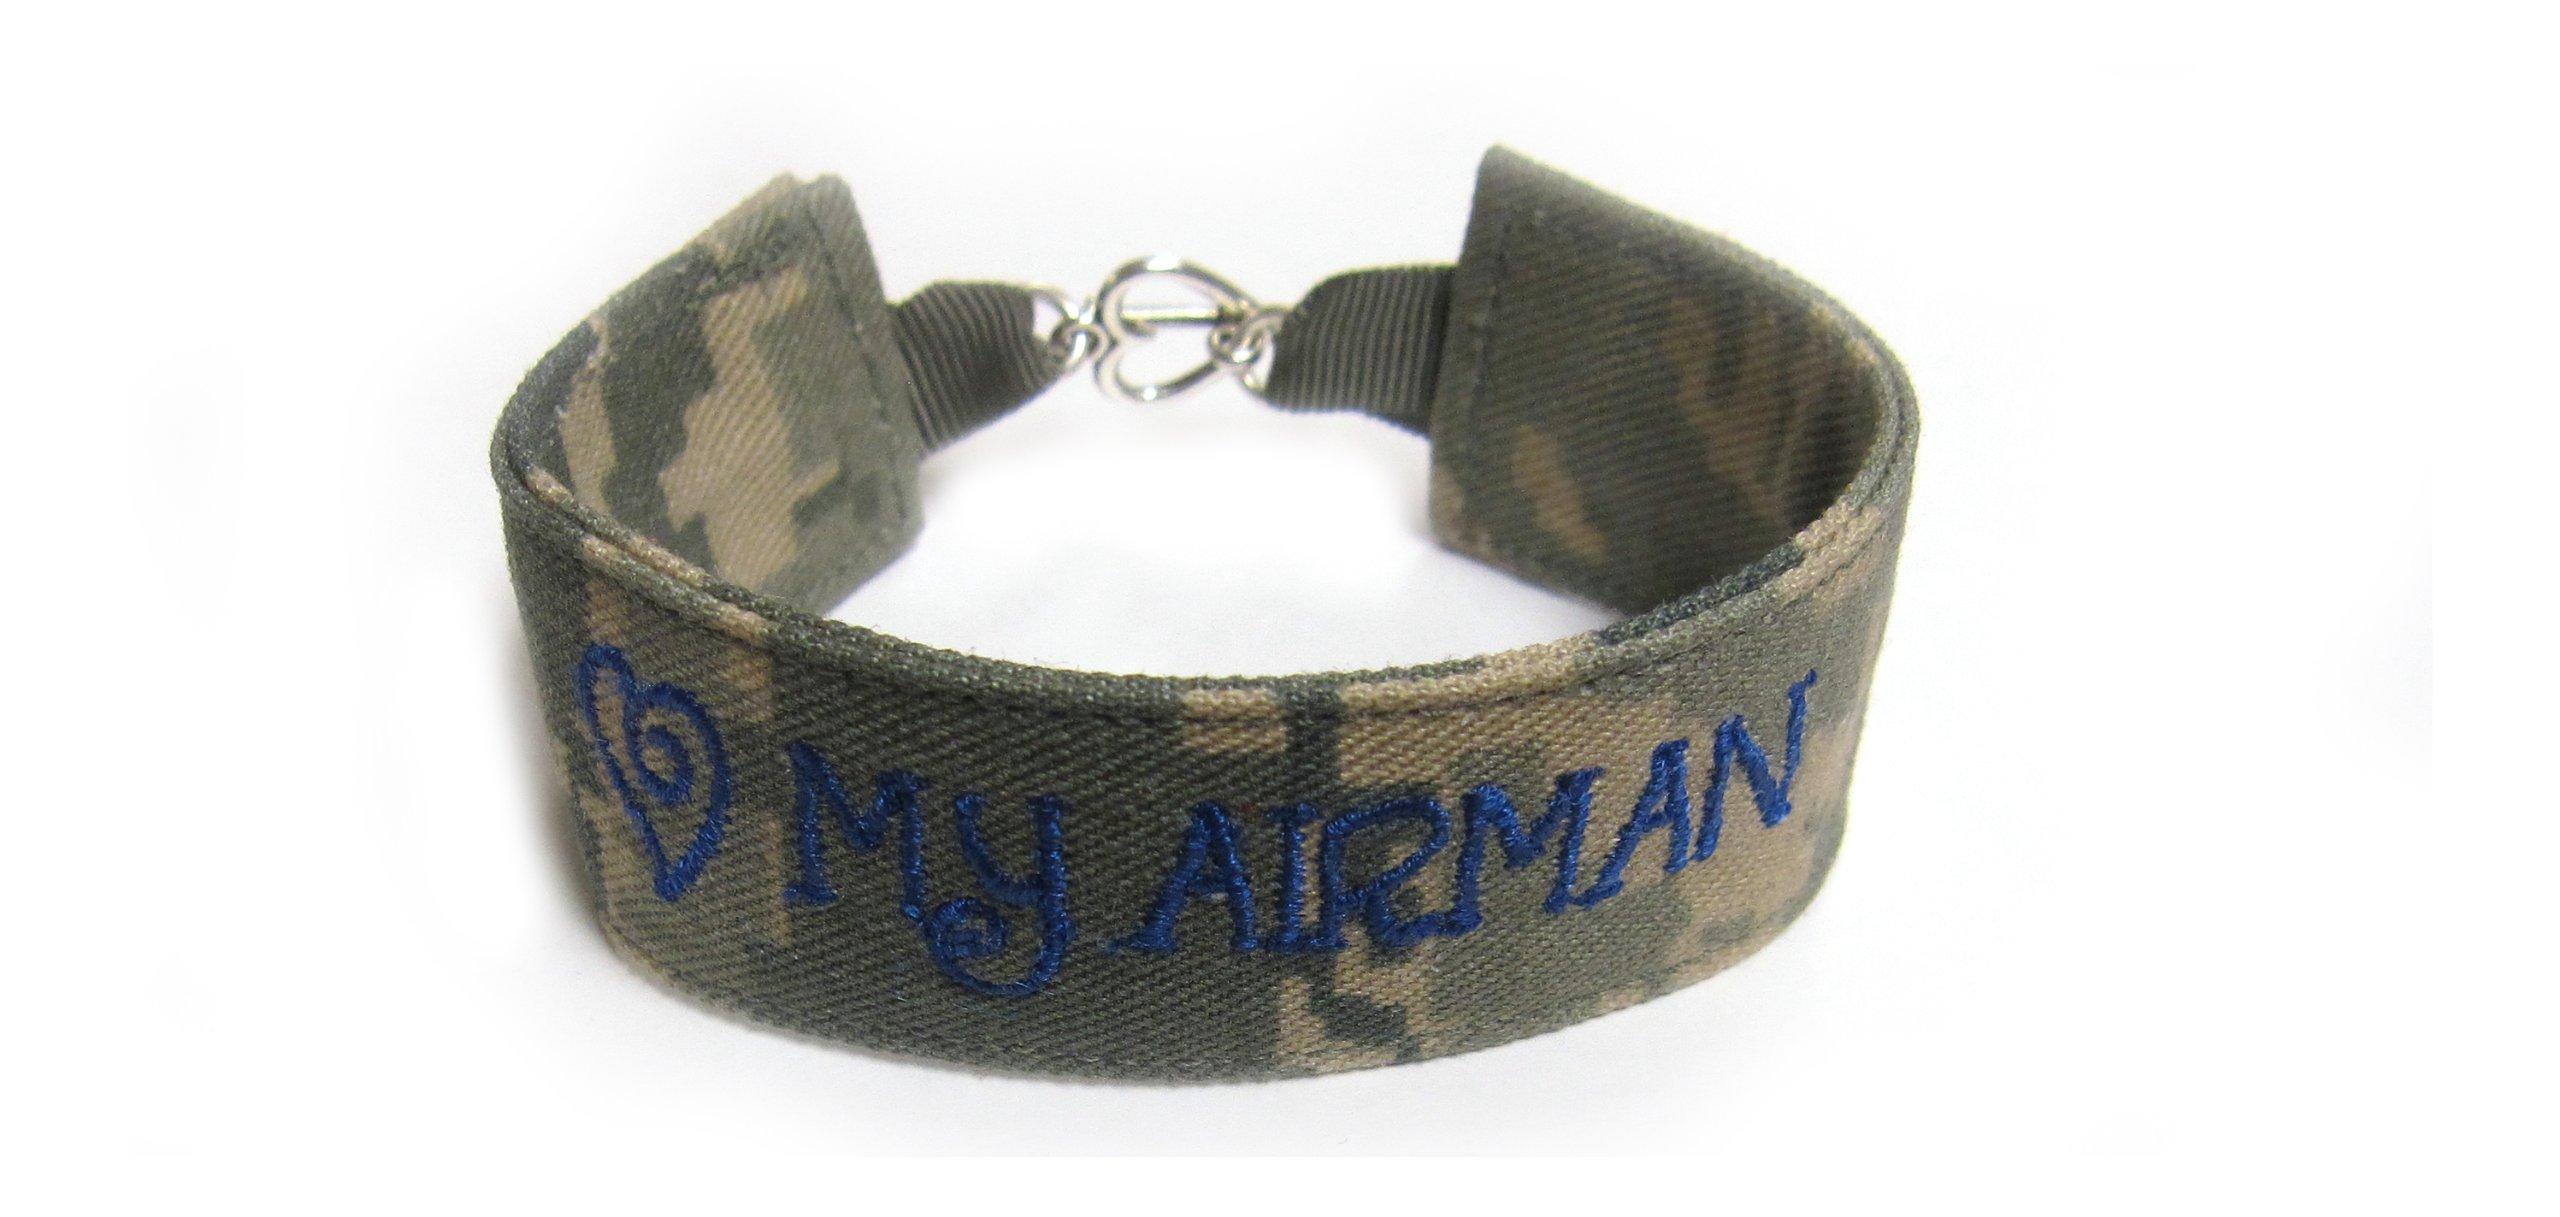 U.S. Air Force Name Tape Military Bracelet, U.S. Air Force Camo Bracelet, USAF Jewelry, Air Force Gifts